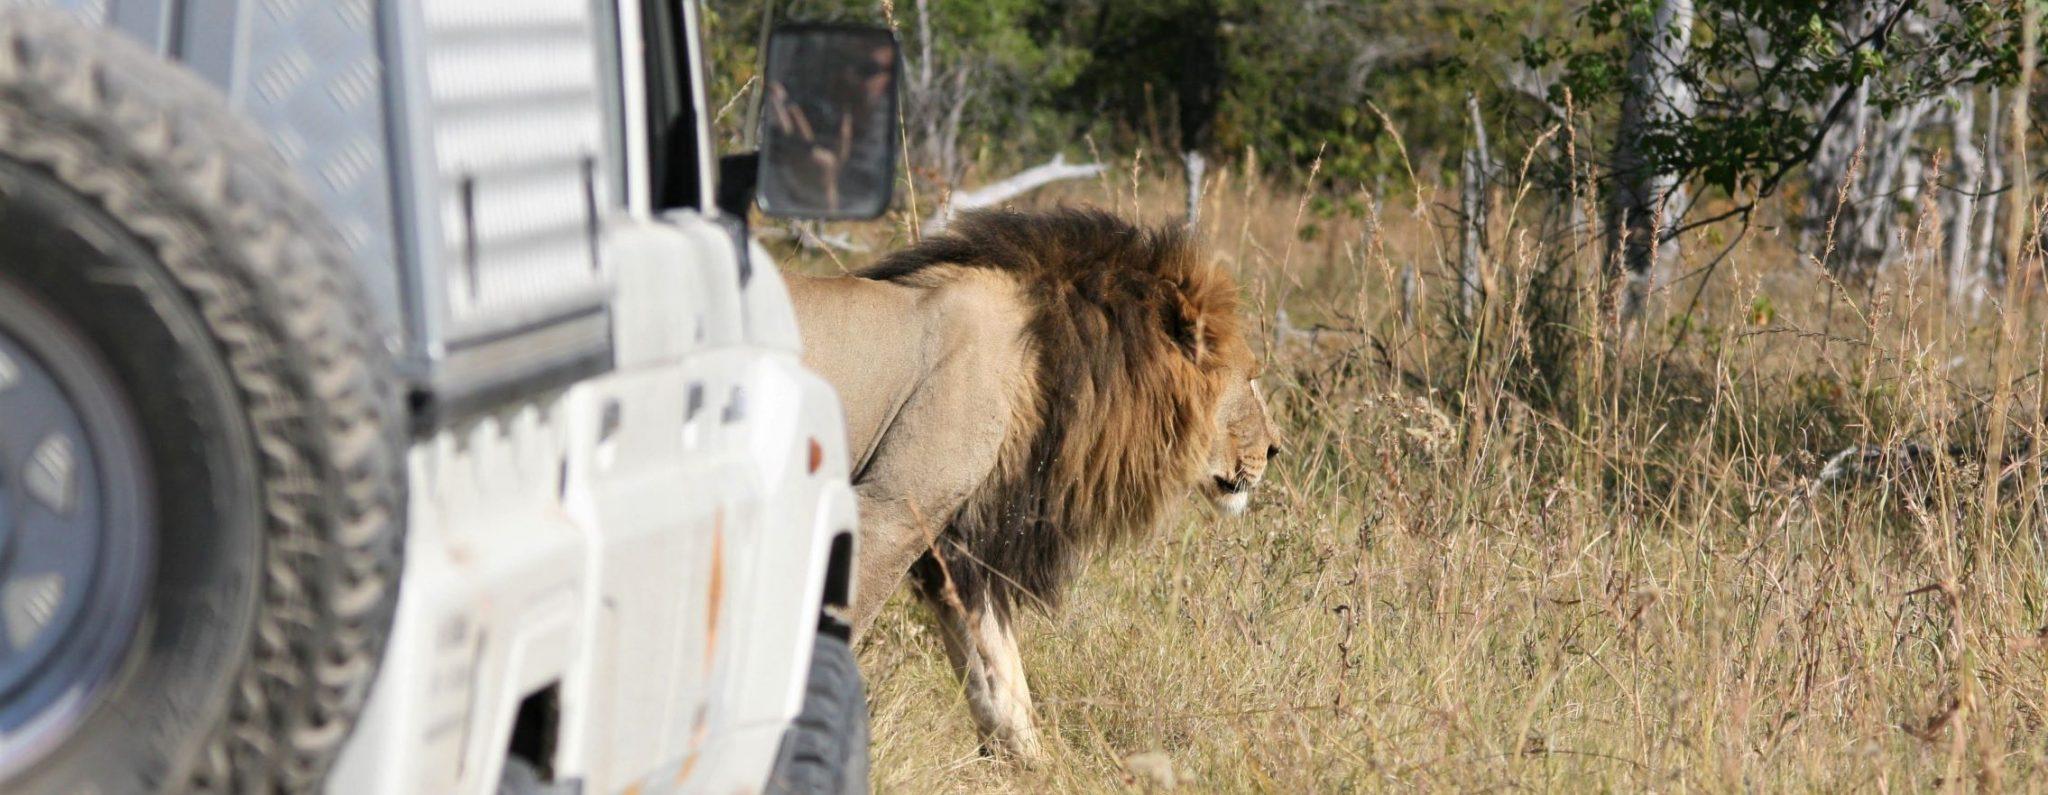 Bittern Botswana Self Drive itineraries